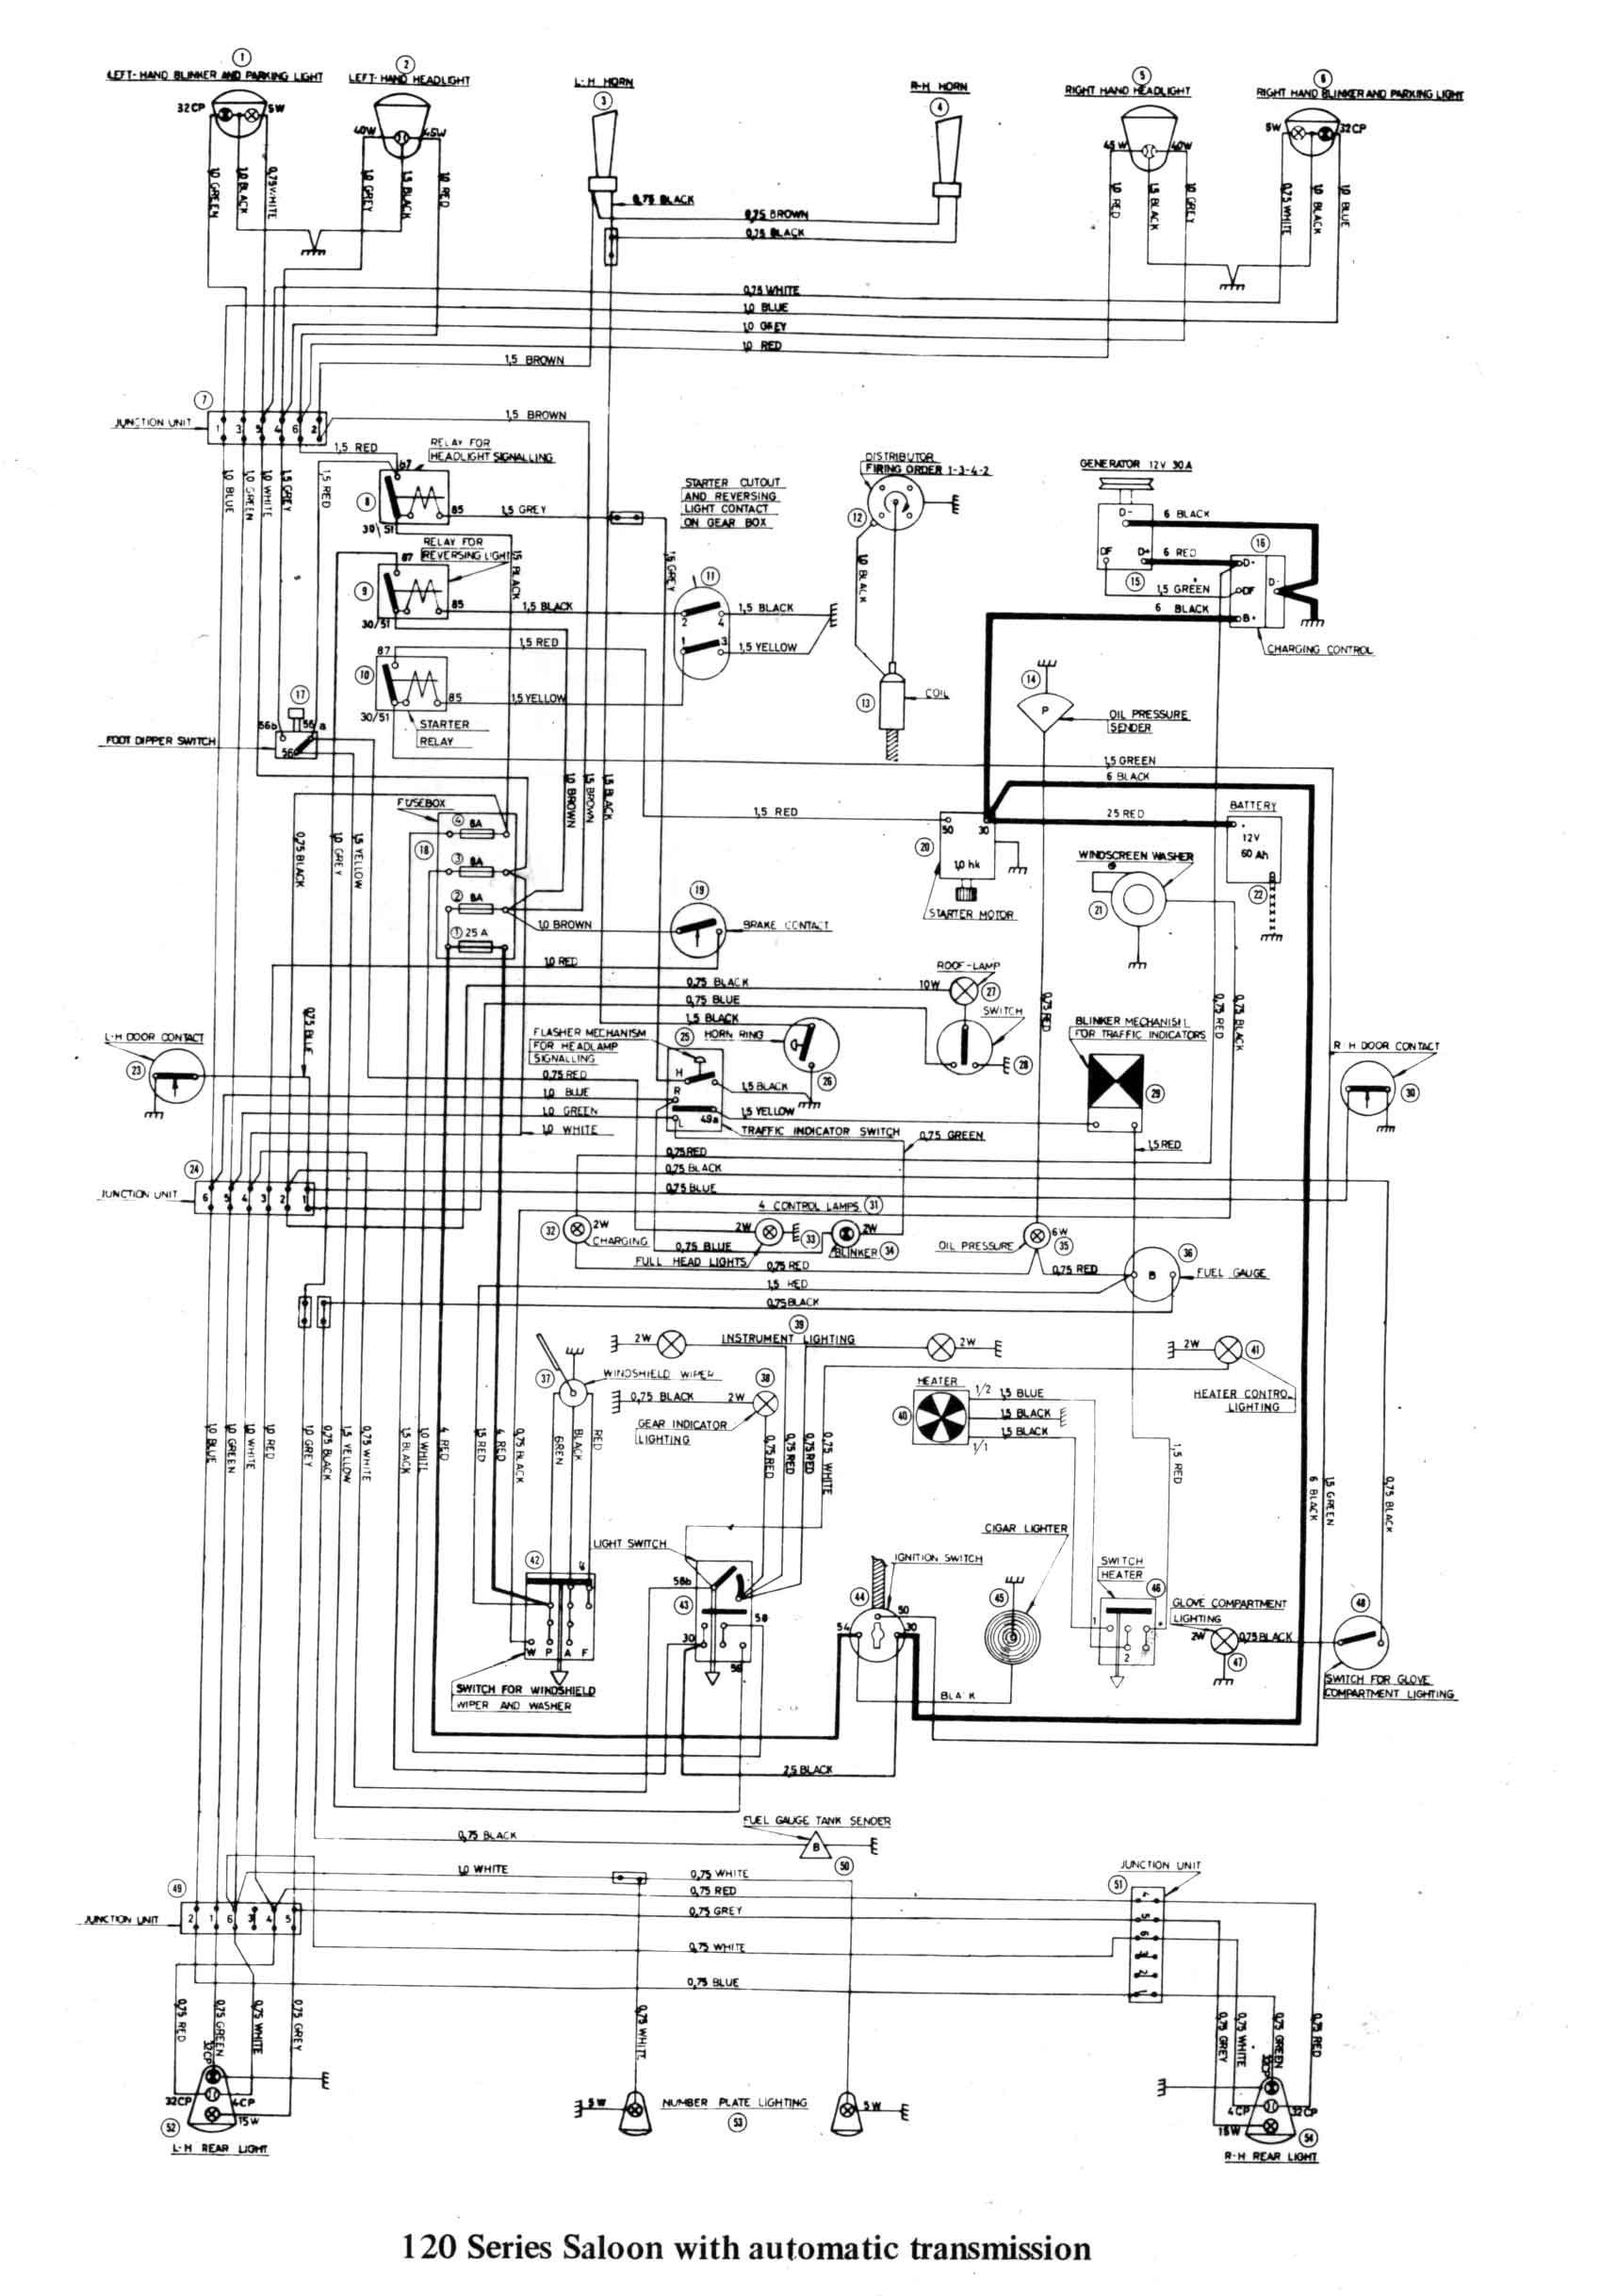 Wiring Diagram Package Ac New Wiring Diagram Package Ac New Wiring Diagram Relay Headlight